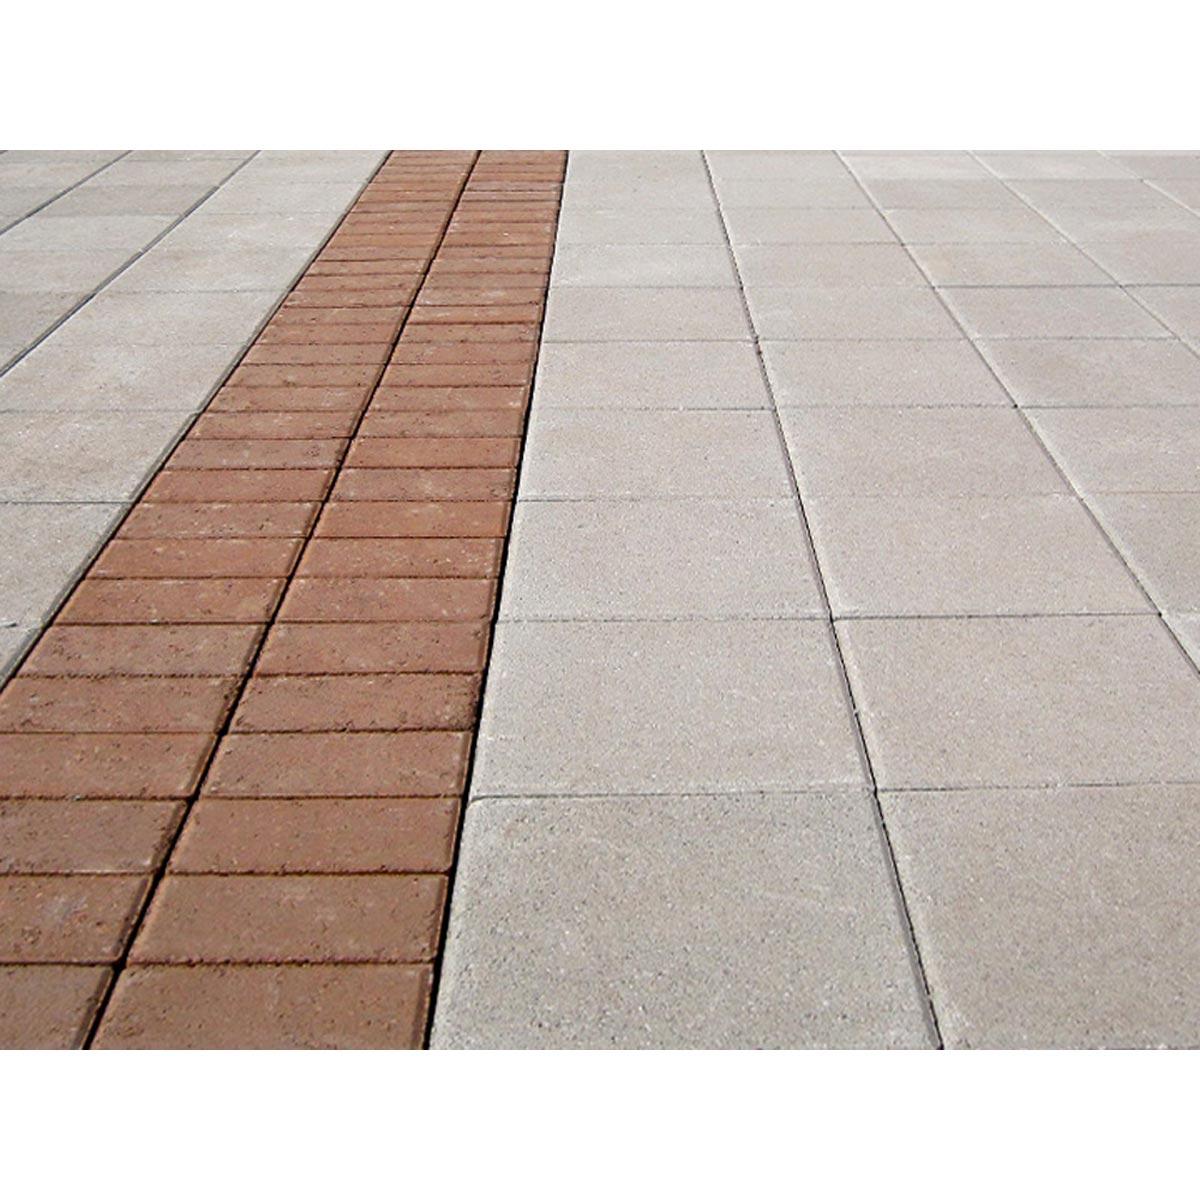 12 in. x 2 in. x 12 in. Square Patio Block